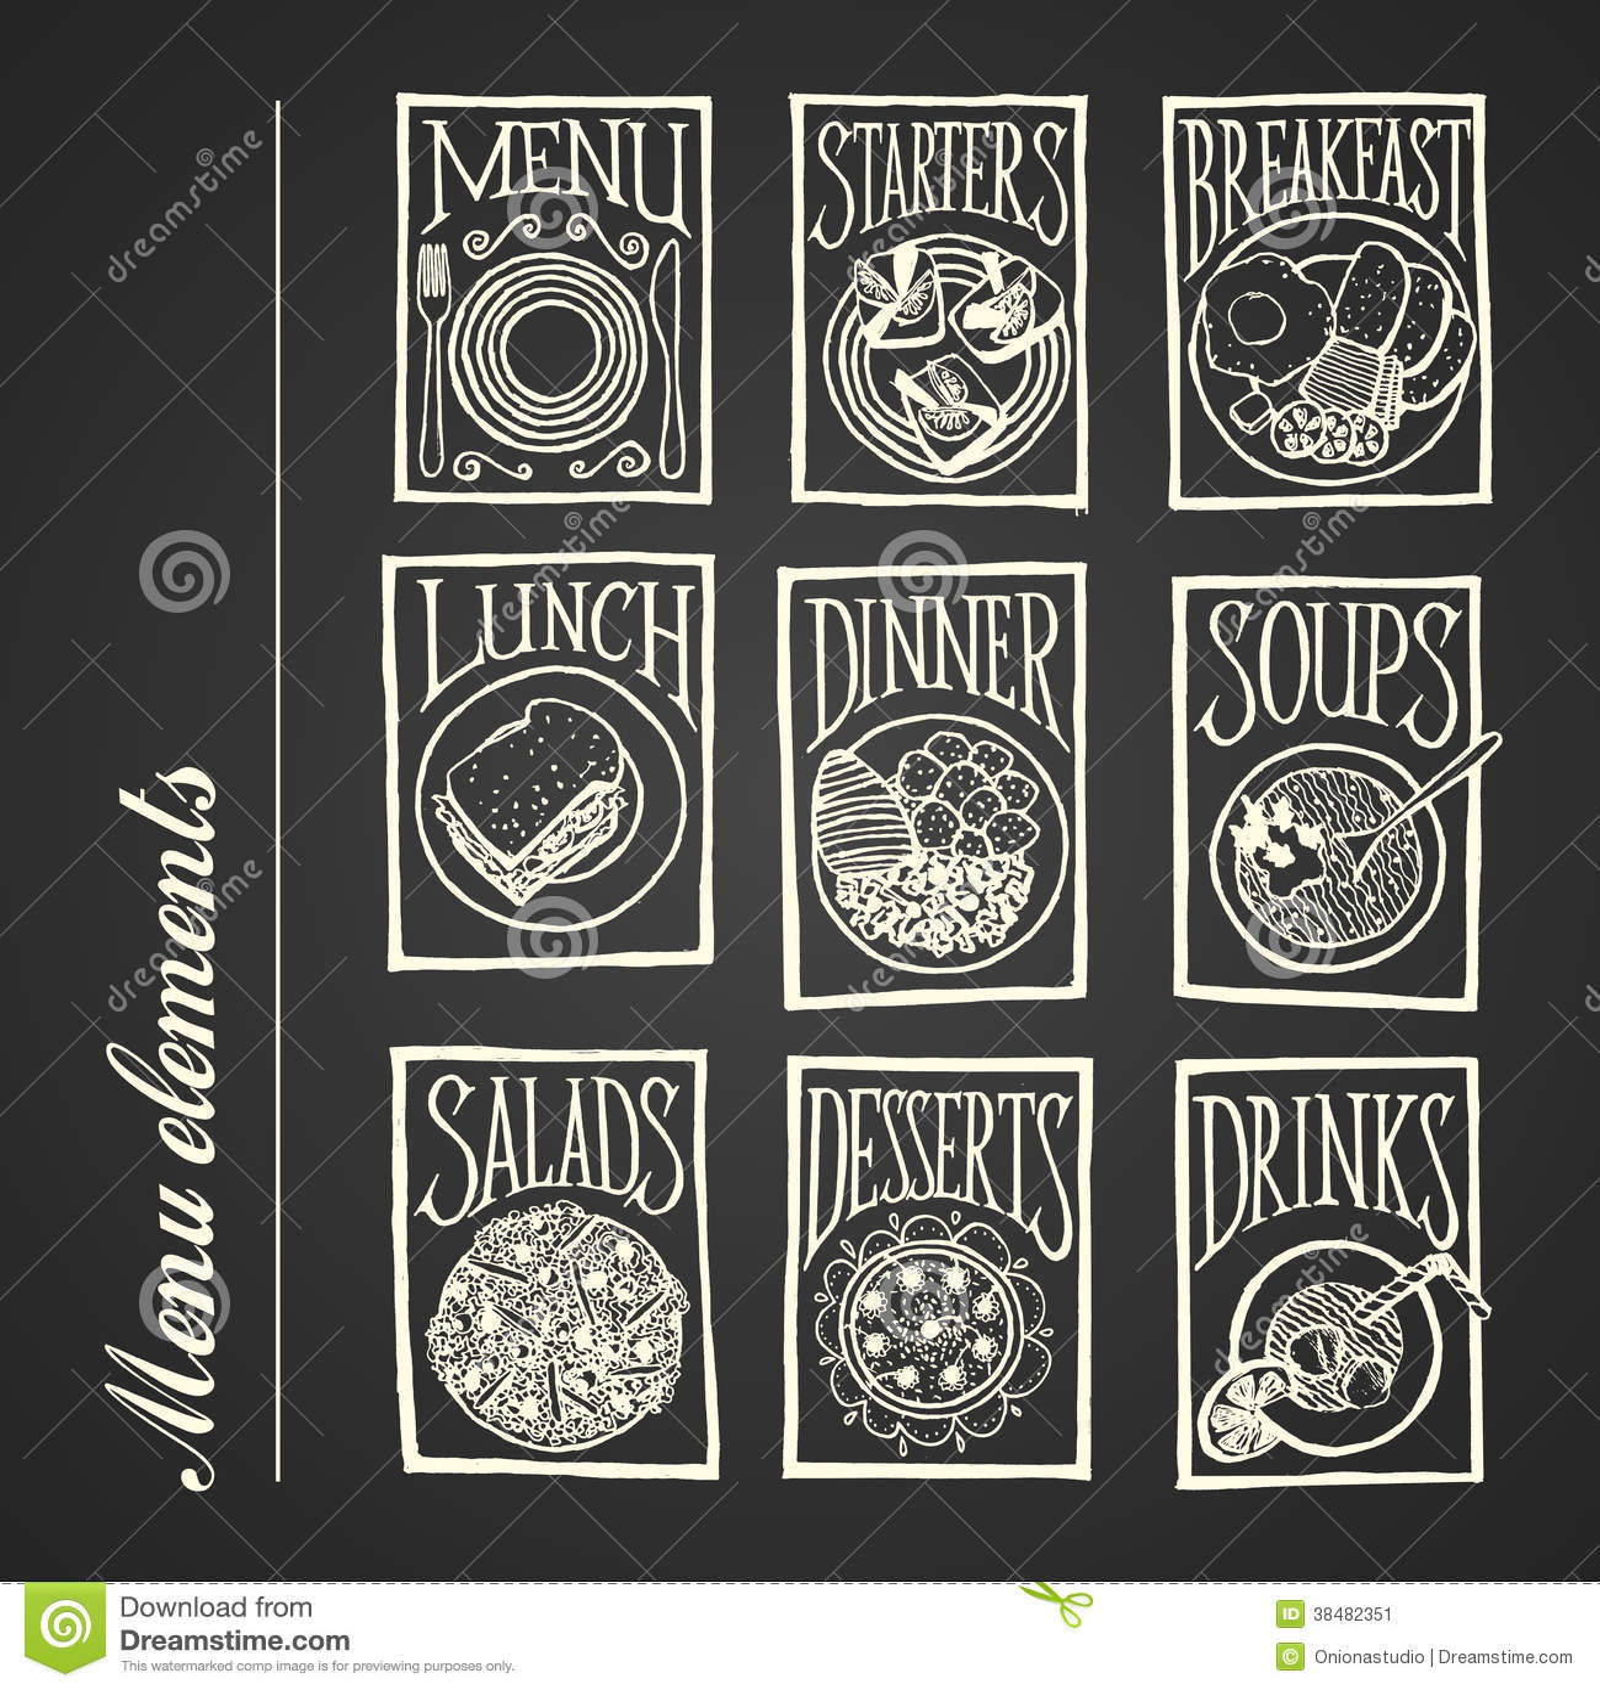 Chalkboard Menu Icons Meals Stock Image Image 38482351